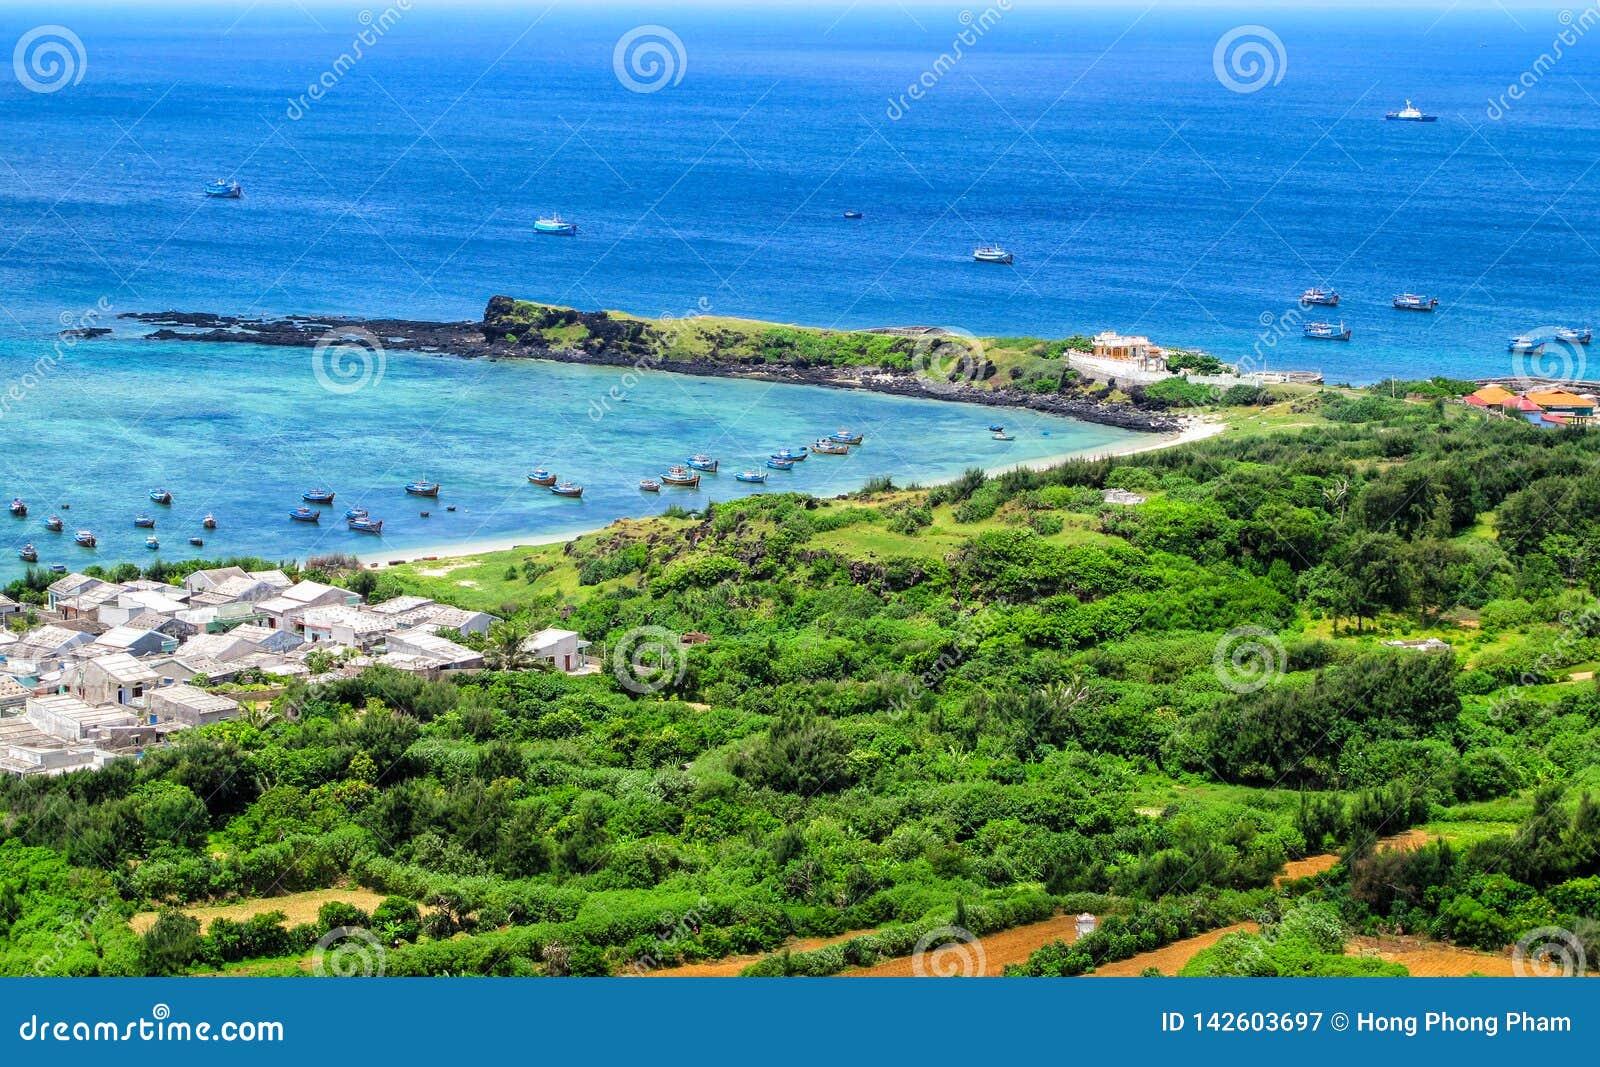 Vista bonita da ilha de Phu Quy em Binh Thuan, Vietname